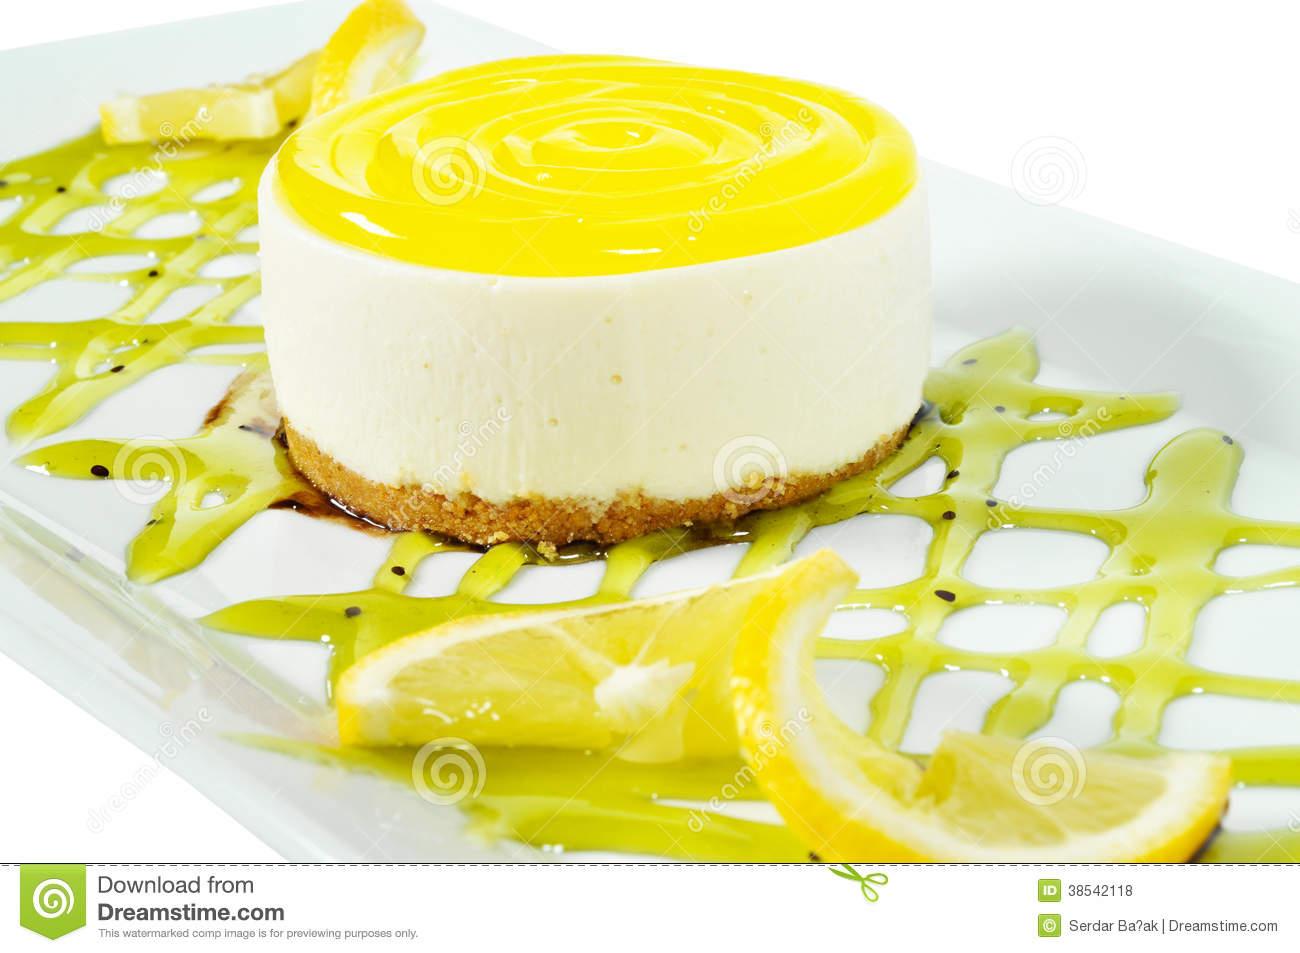 Lemon Delicious Looking Cakes